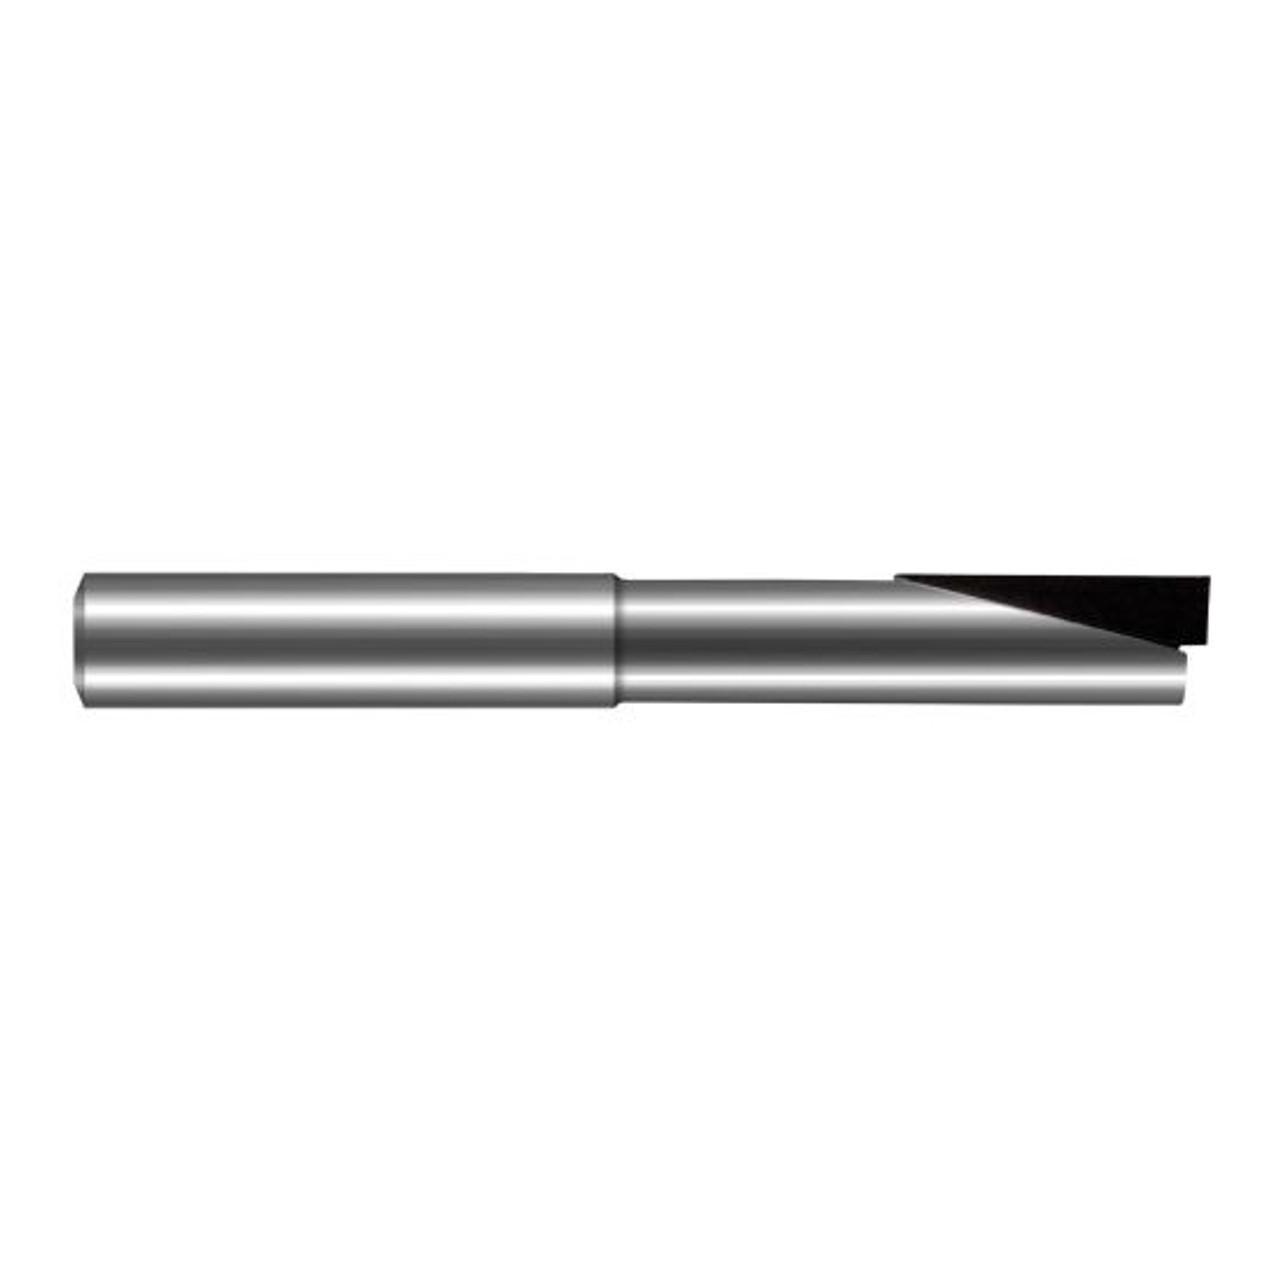 "Harvey Tool Carbide Ball End Mill CVD Diamond 0.2850/"" LOC x 3/"" OAL 4FL 62112"